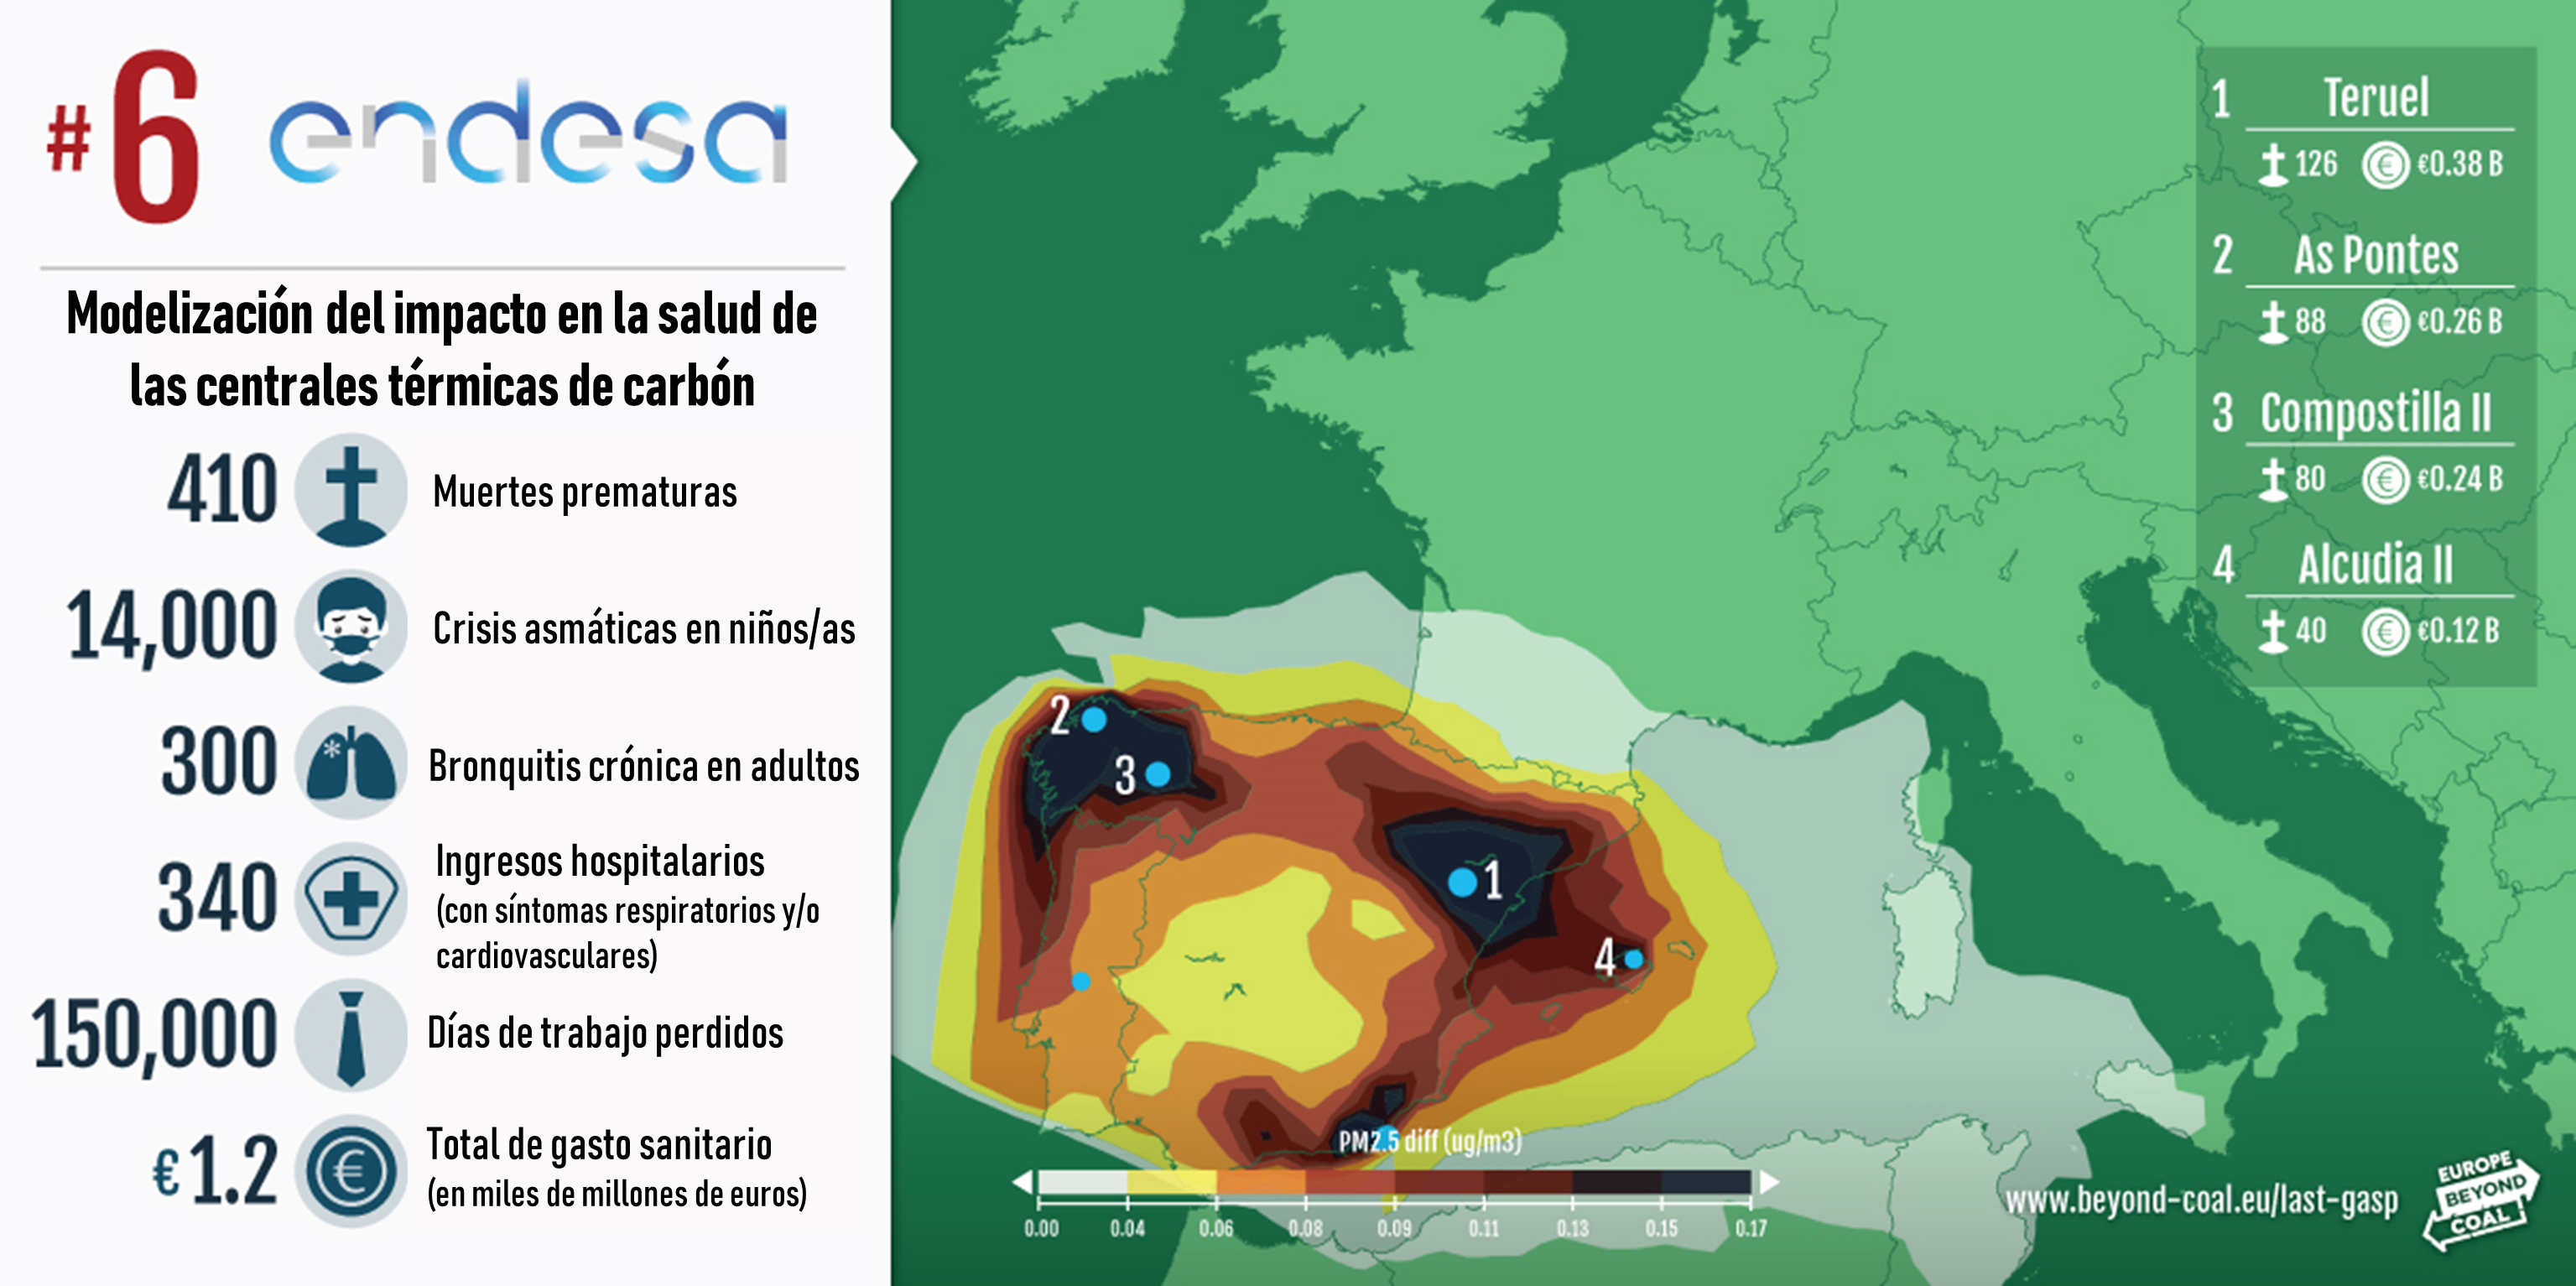 impactos centrales de carbón Endesa